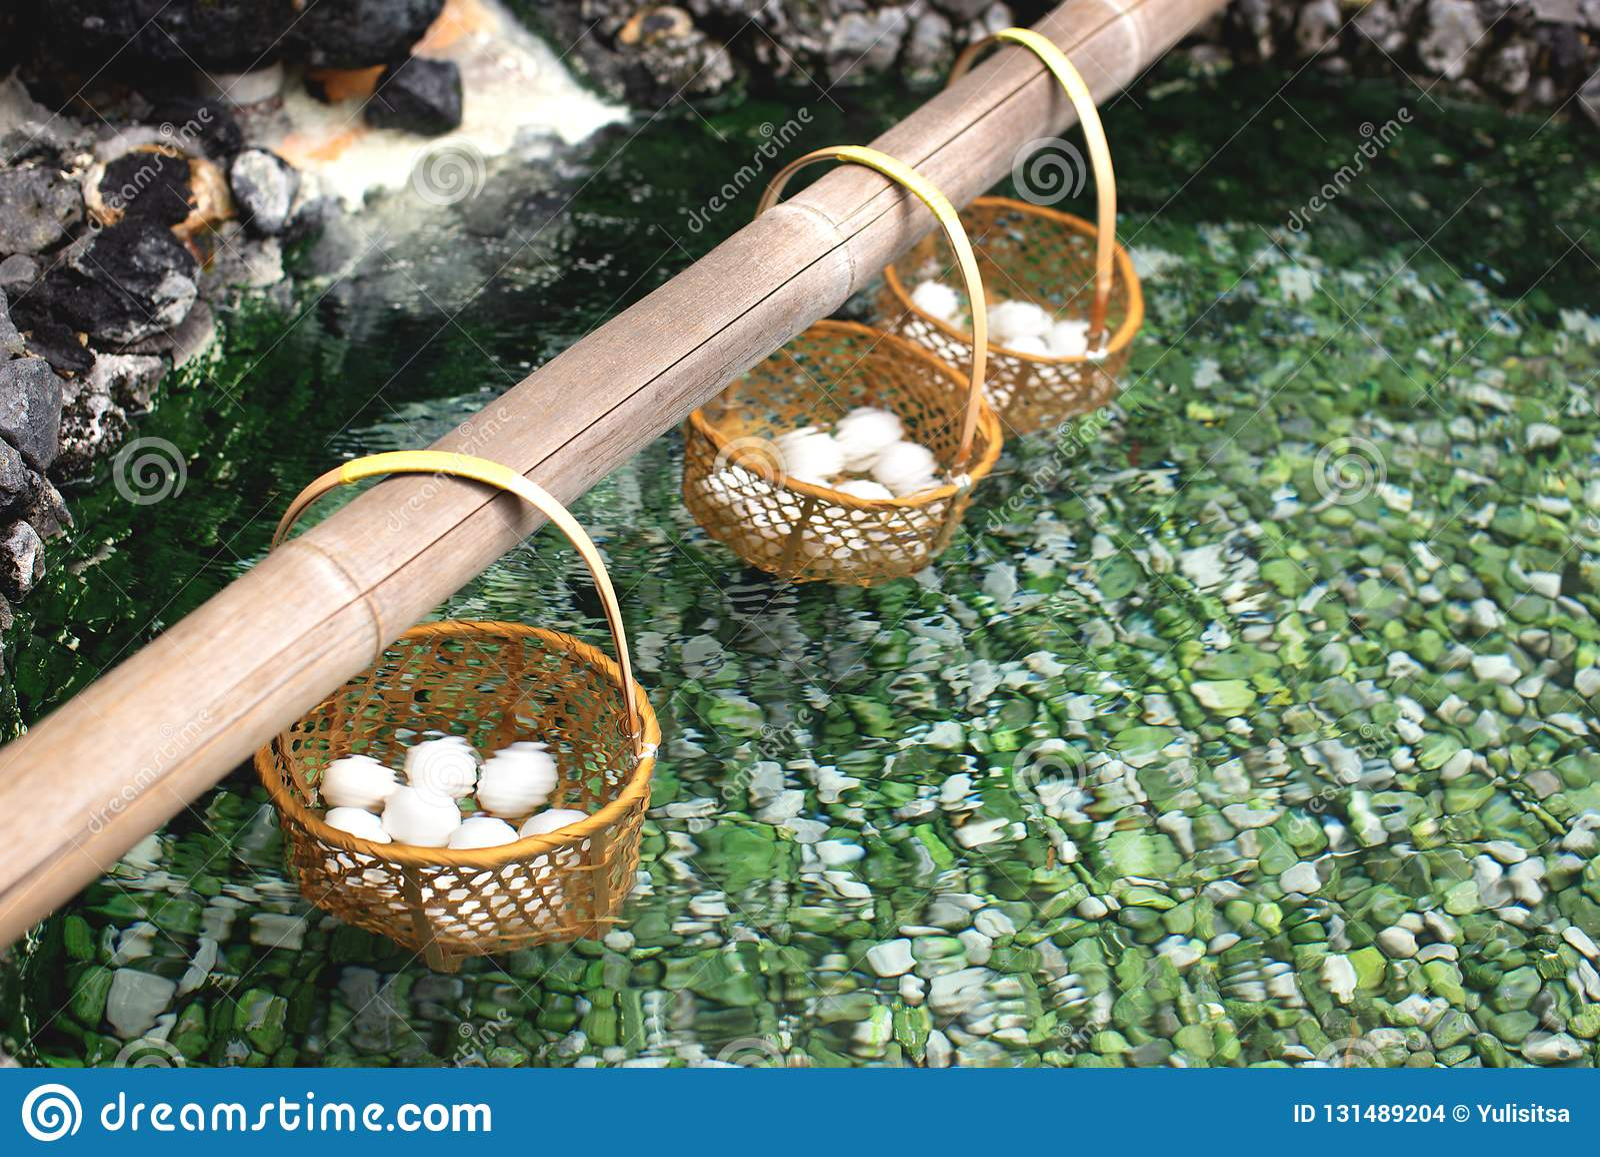 Eggs boiled in hot spring